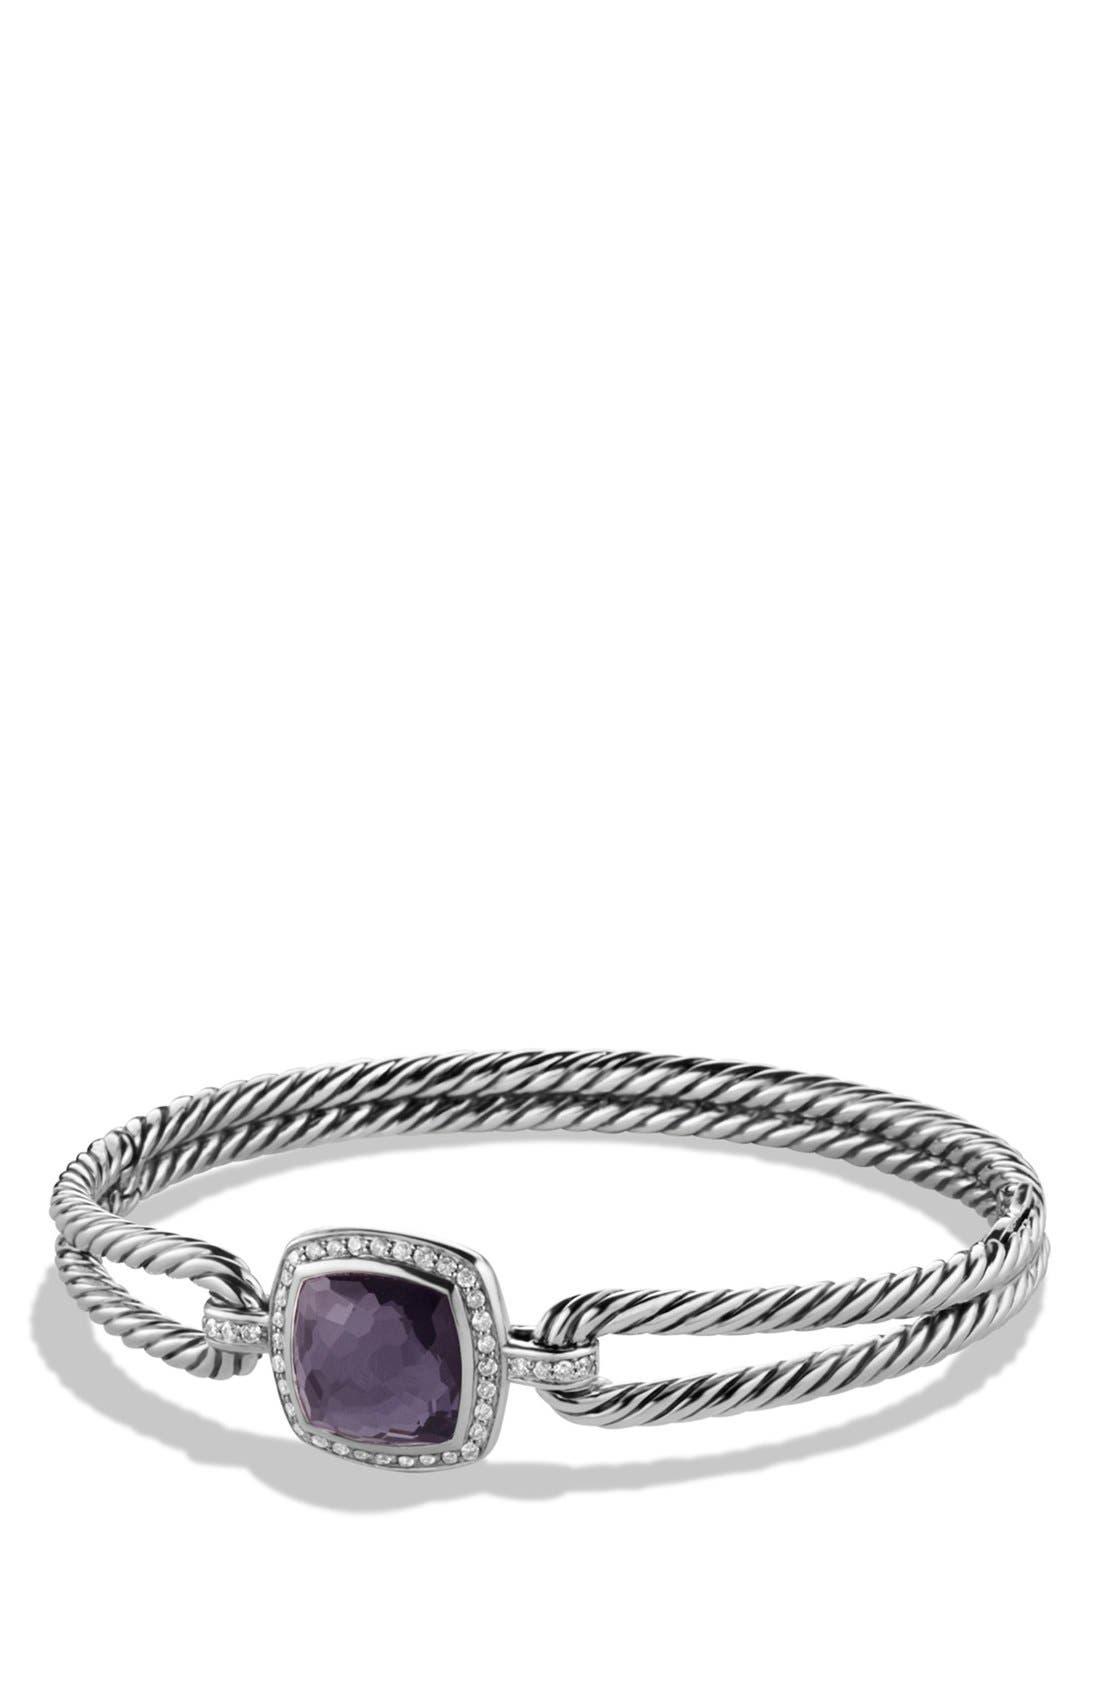 David Yurman 'Albion' Bracelet with Semiprecious Stone and Diamonds